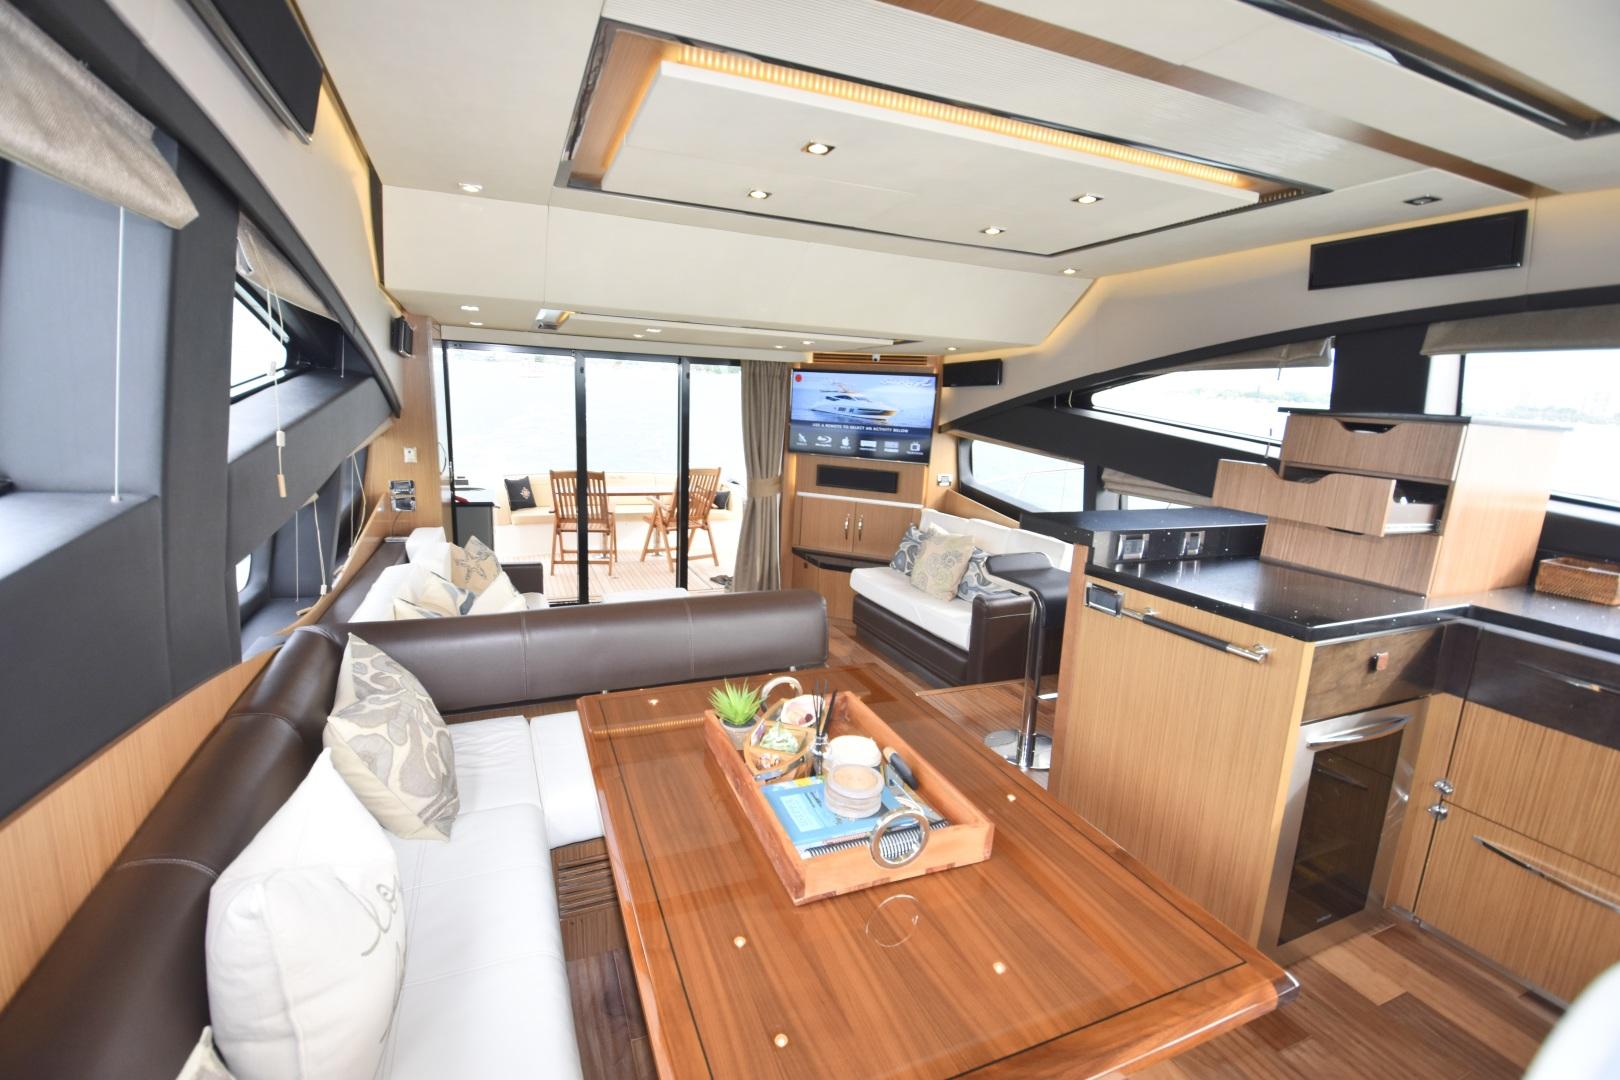 Sea Ray-L650 2016-3x's the Charm Longboat Key-Florida-United States-2016 Sea Ray L650  3x's the Charm  Dinette / Galley / Salon-1251787 | Thumbnail